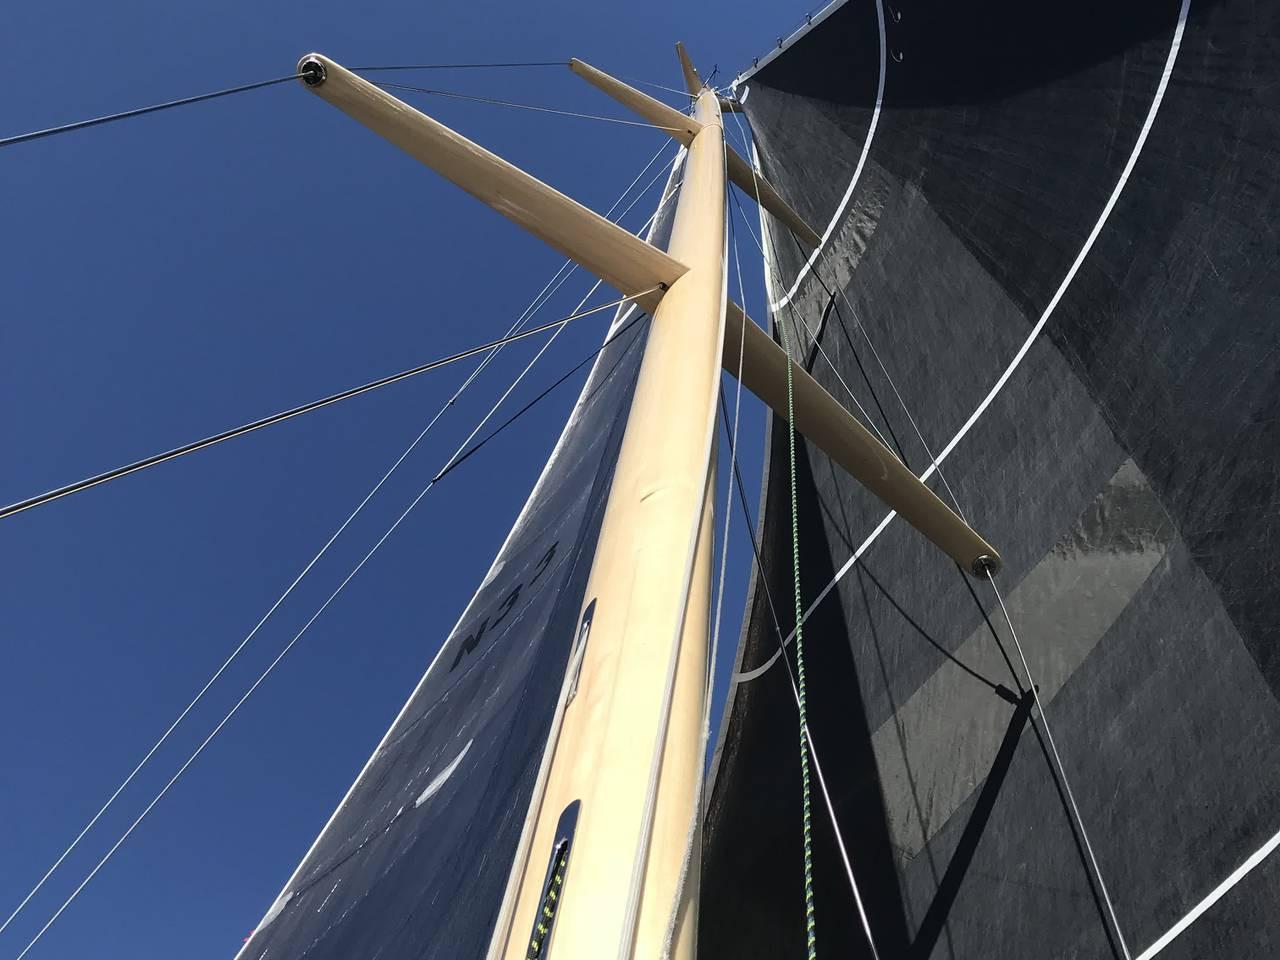 Sira sailing 4.jpg